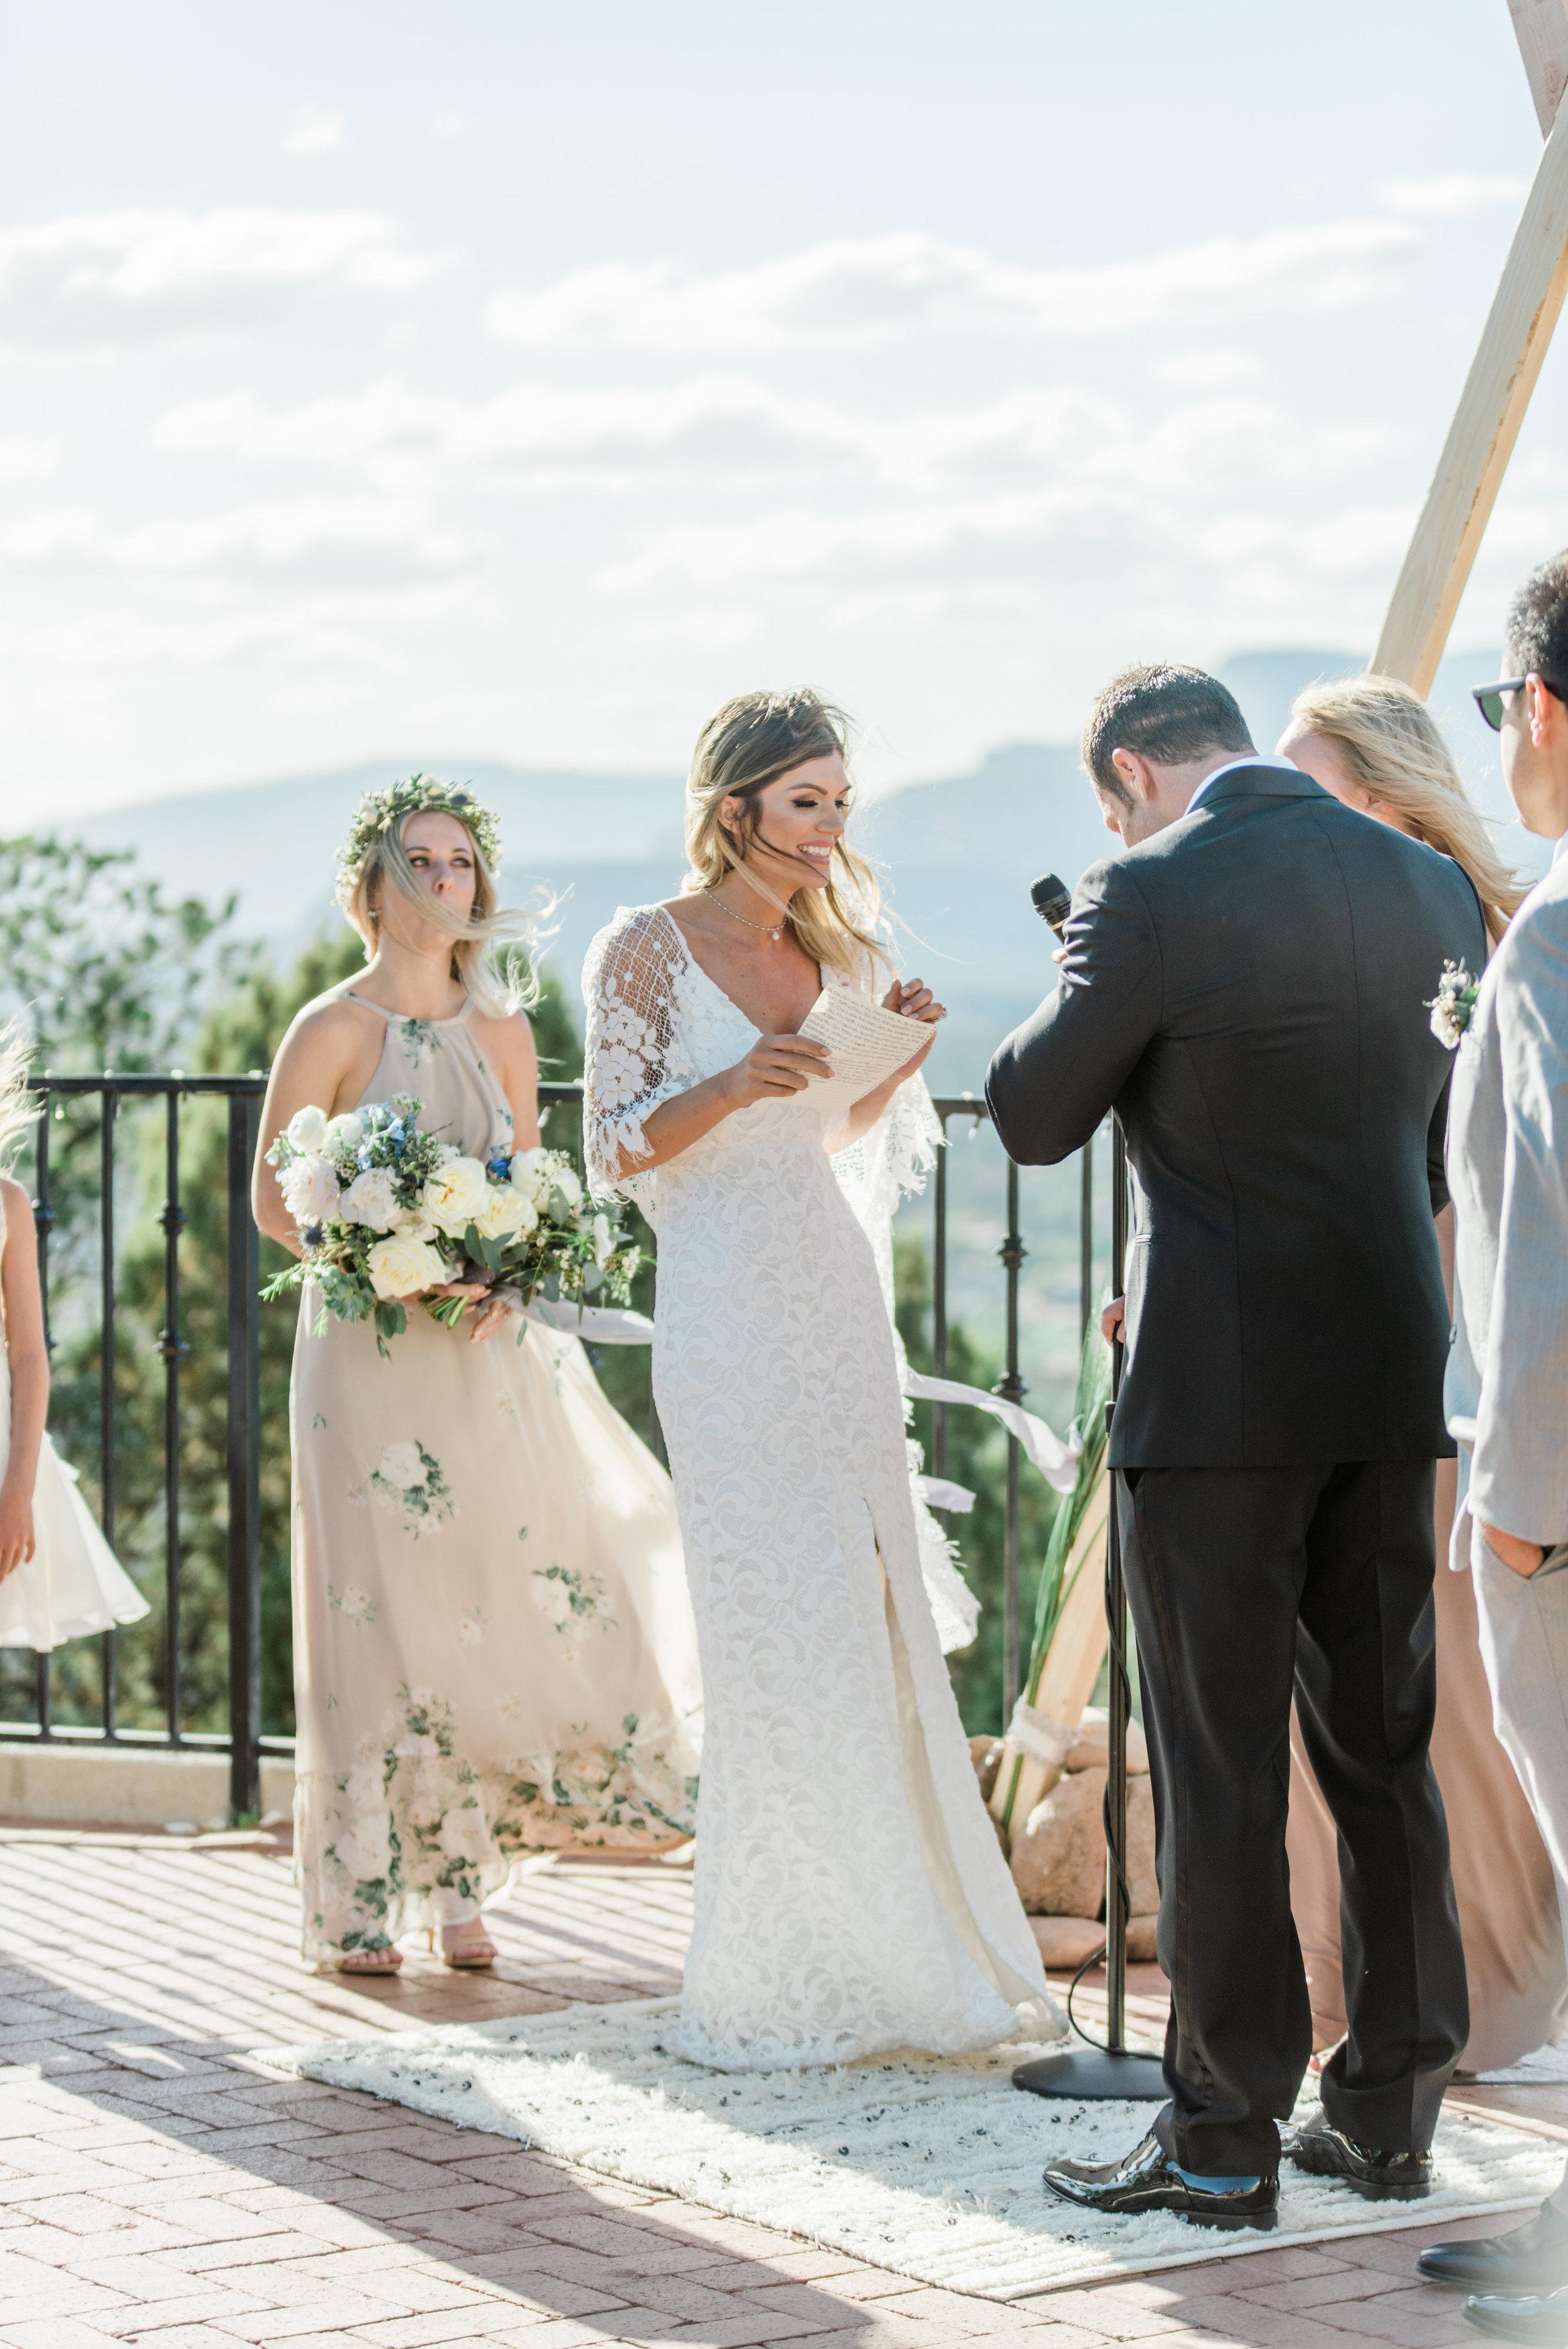 Boho Sedona Wedding - Ceremony